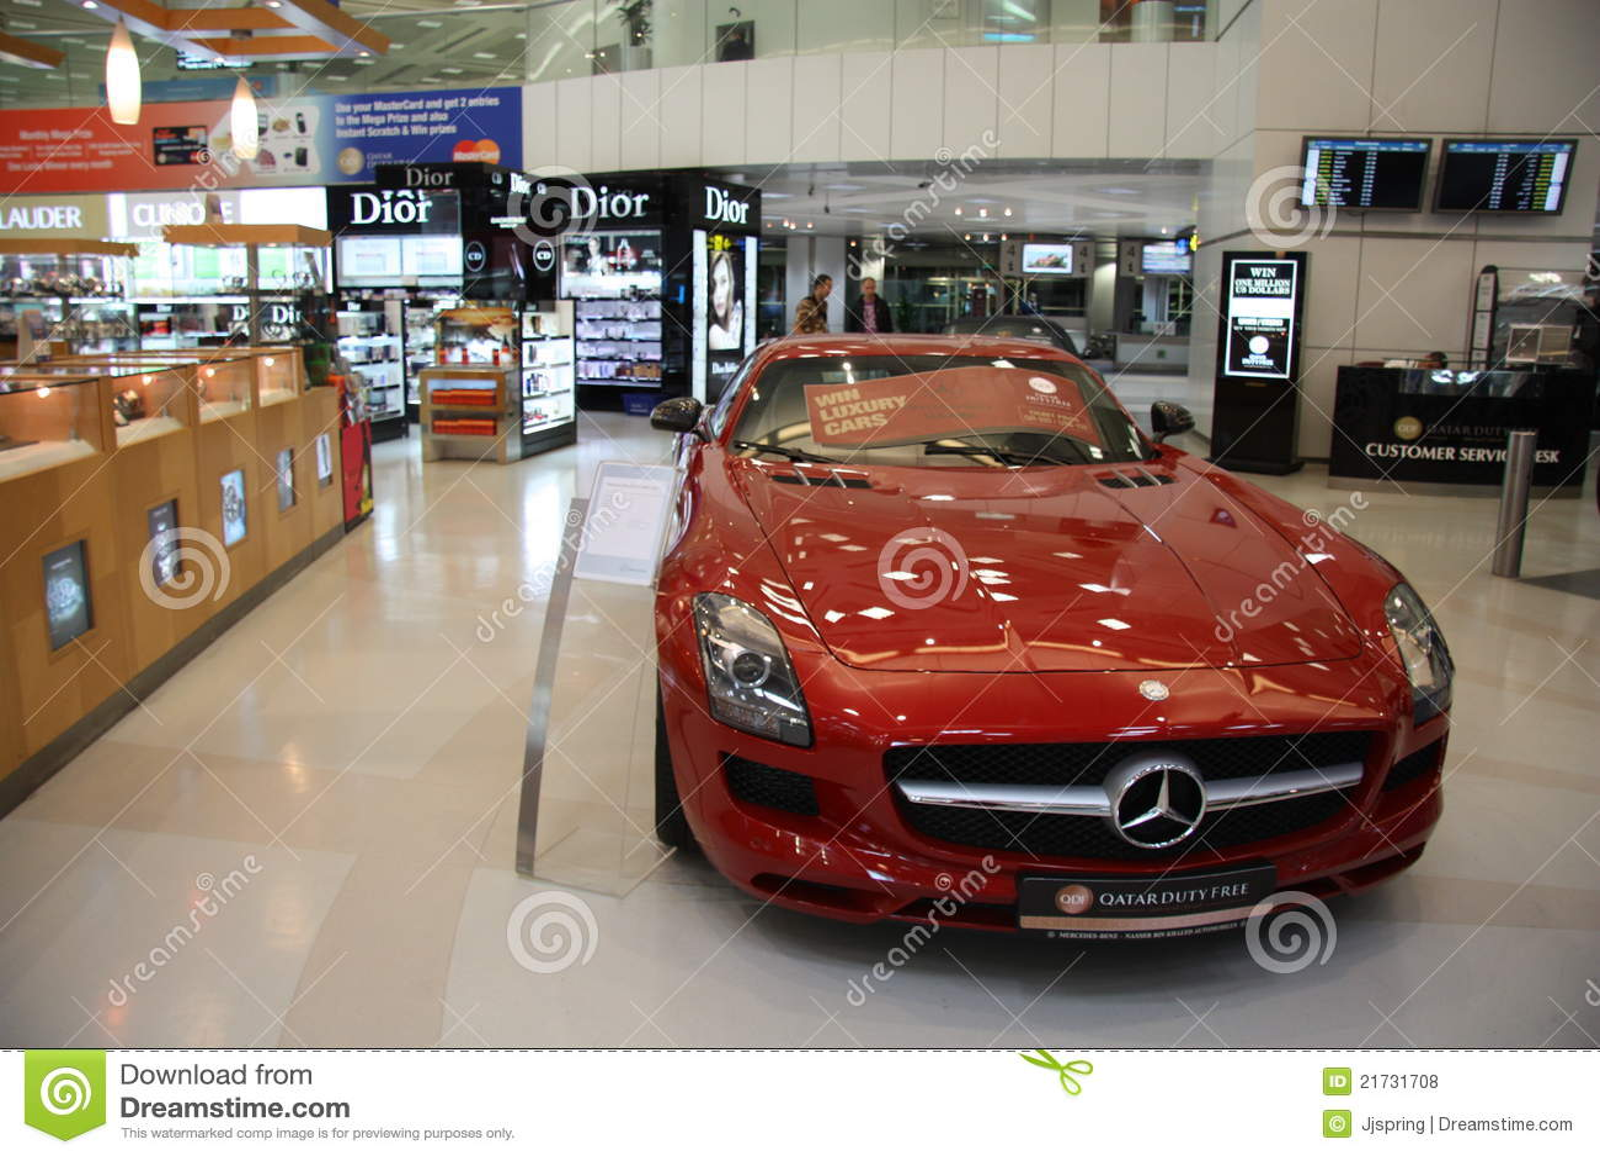 Aeroporto Del Qatar : Loja isenta de direitos aduaneiros no aeroporto doha